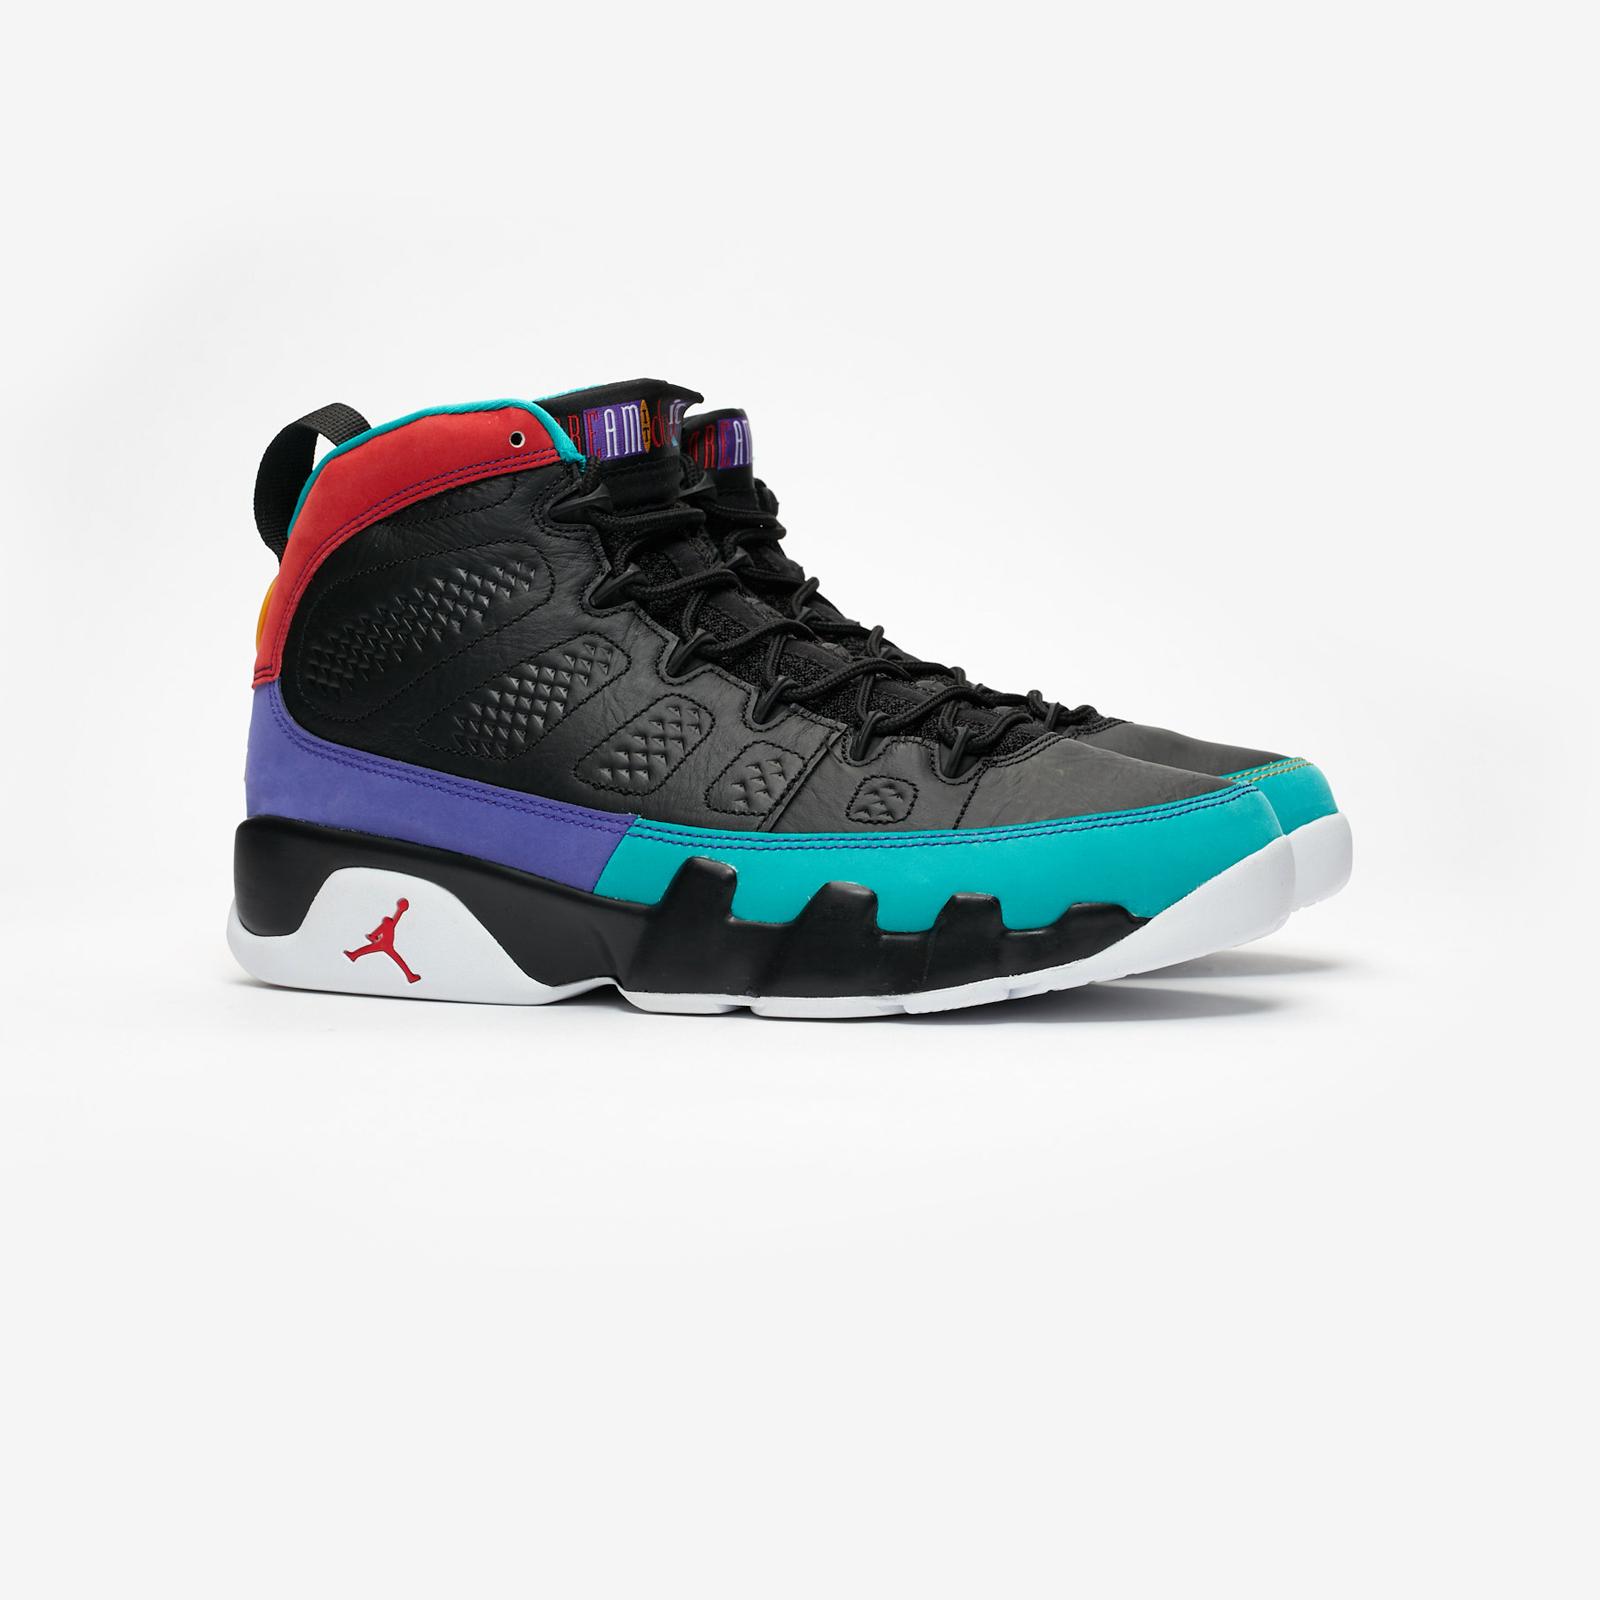 265dde7aac496c Jordan Brand Air Jordan 9 Retro - 302370-065 - Sneakersnstuff ...